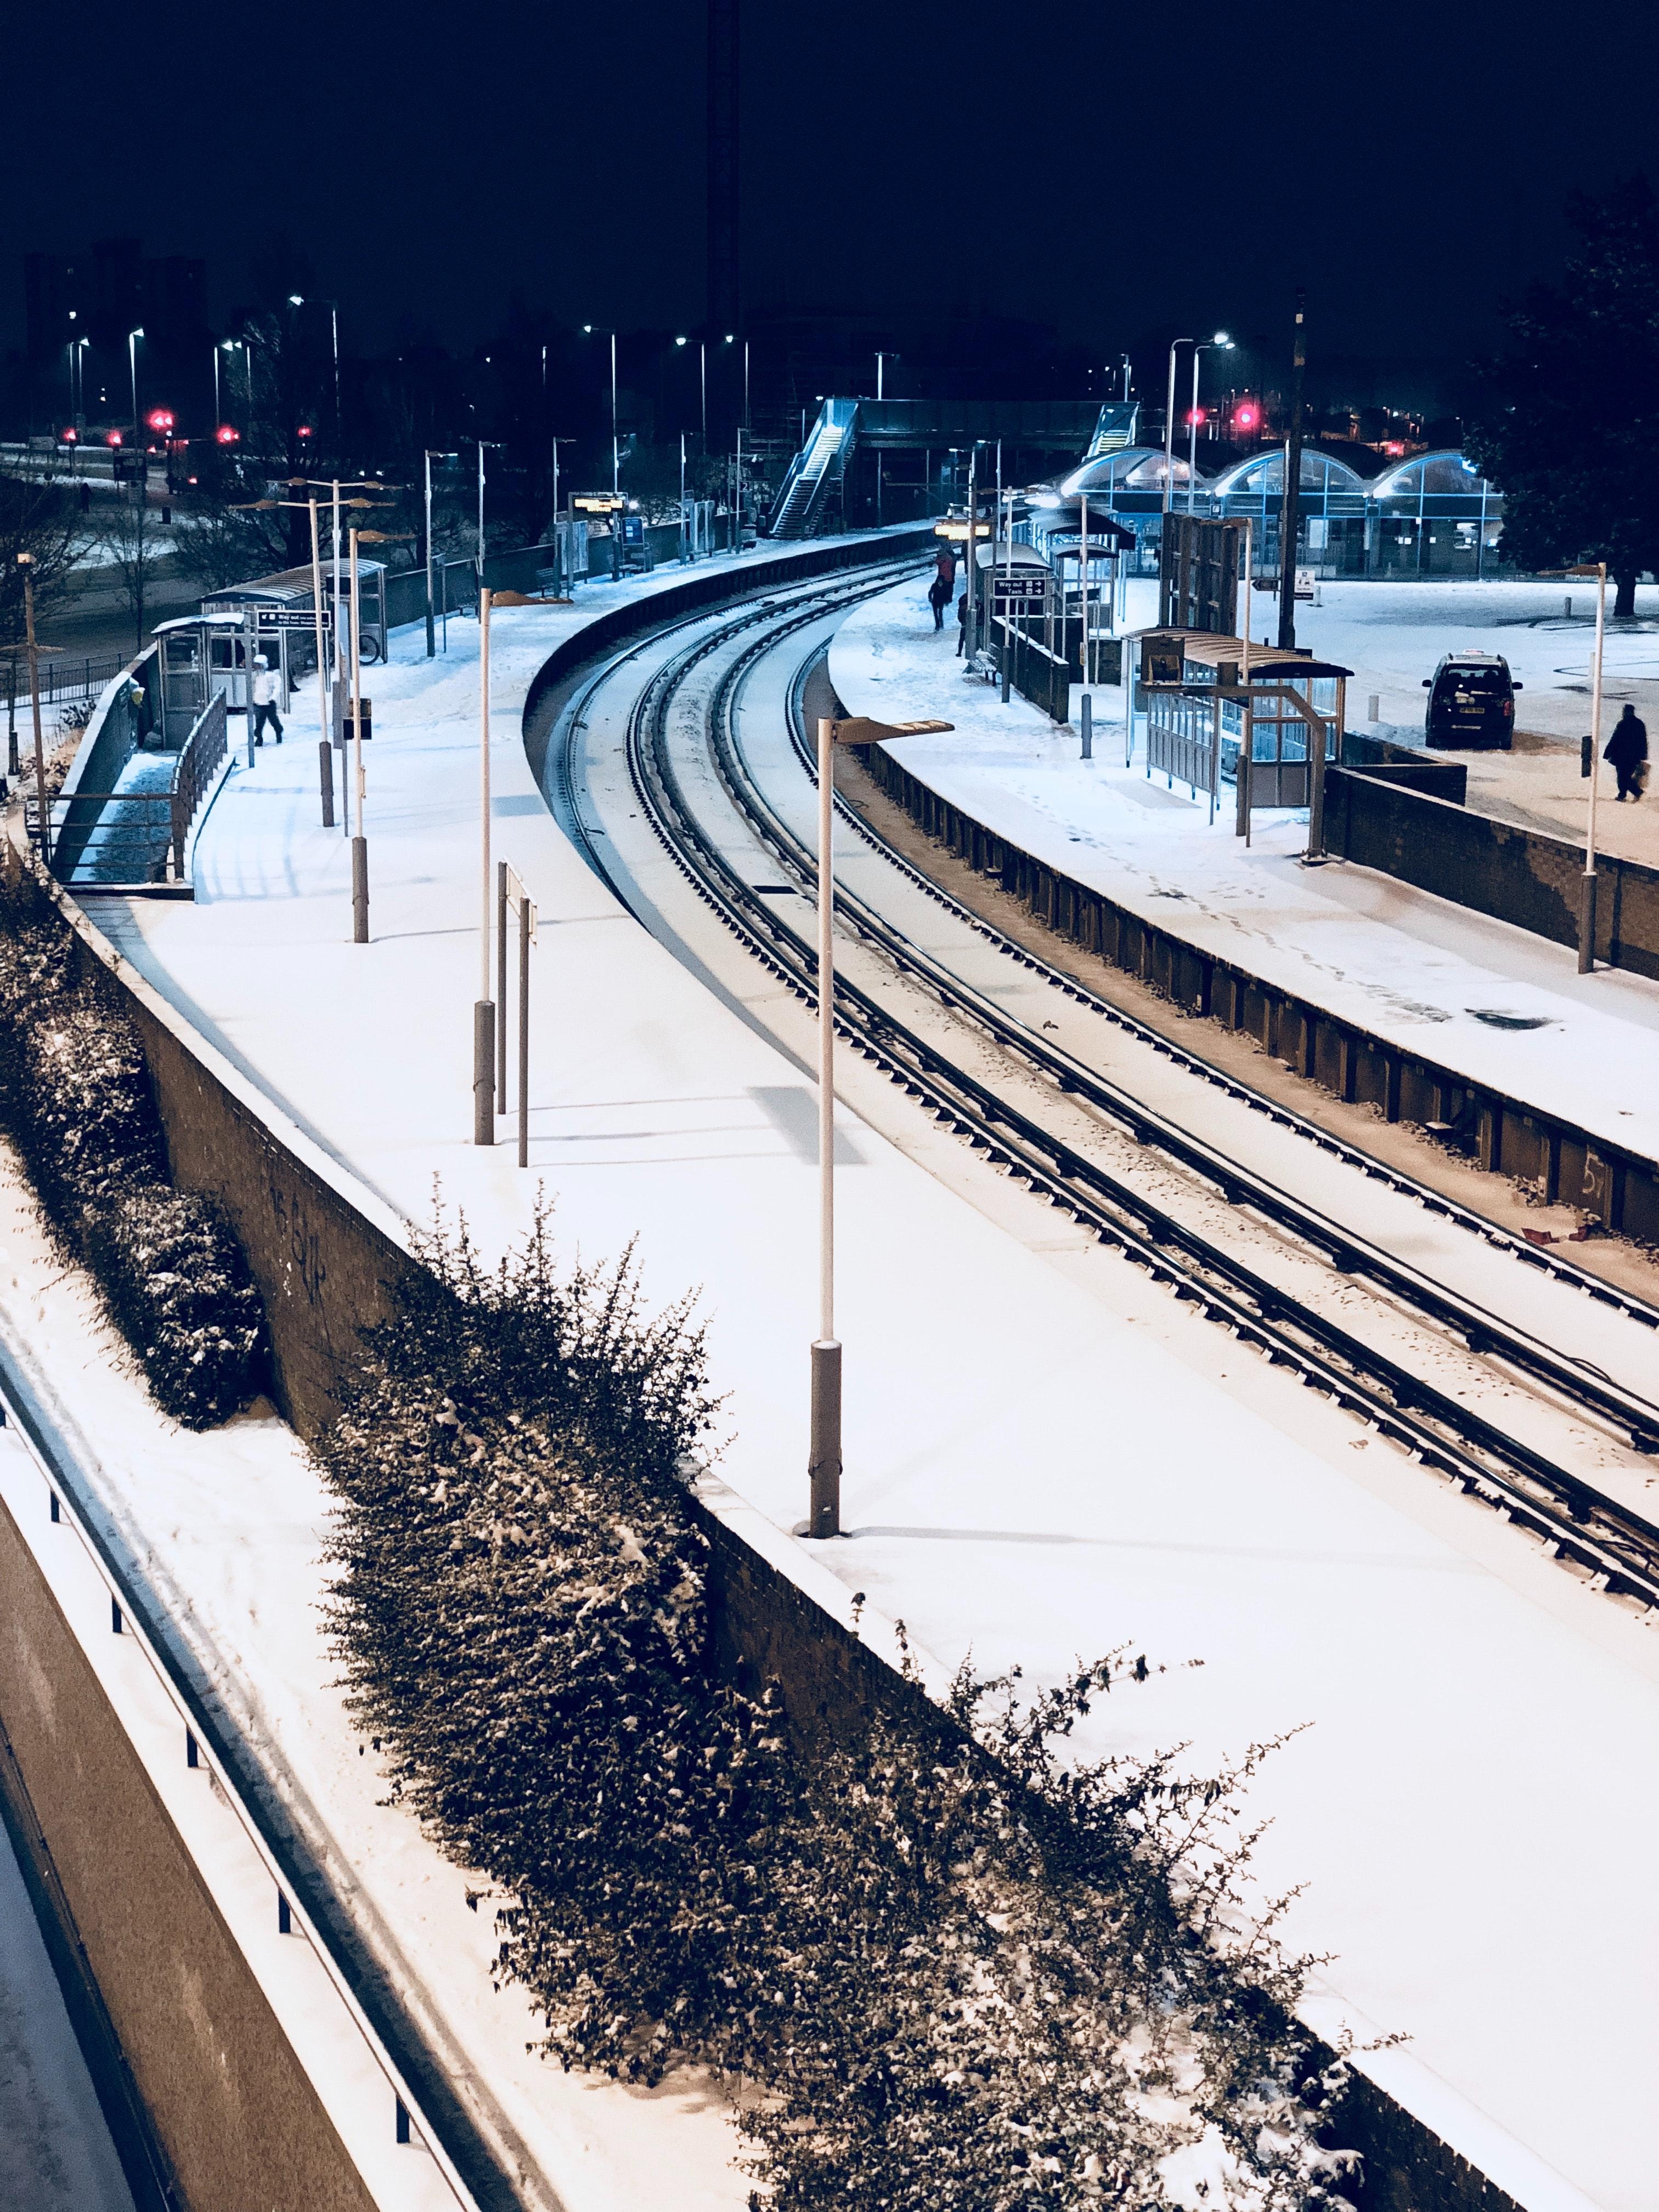 картинки станции зимой